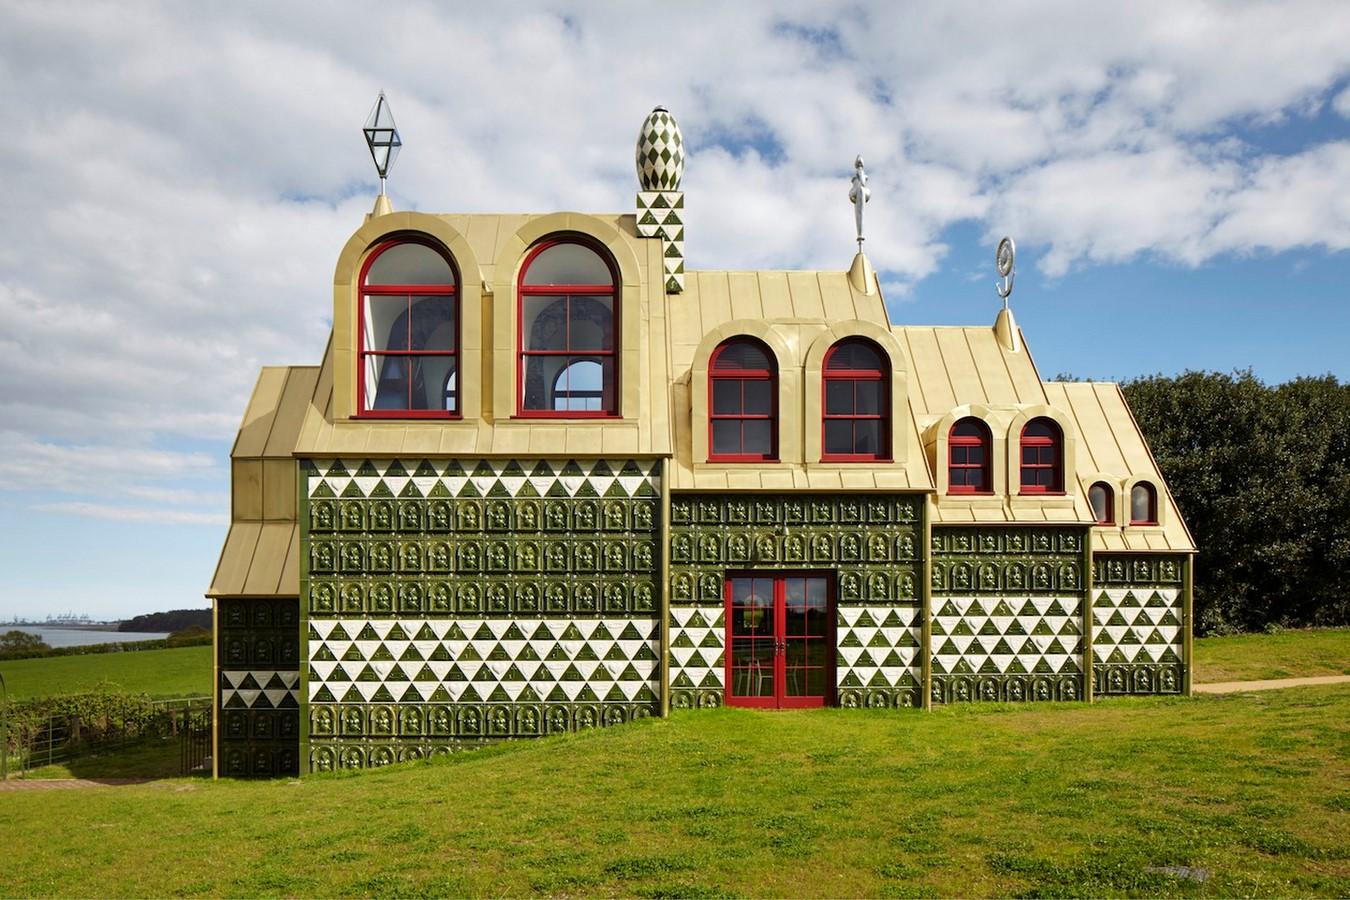 A House for Essex, Wrabness, United Kingdom - Sheet2